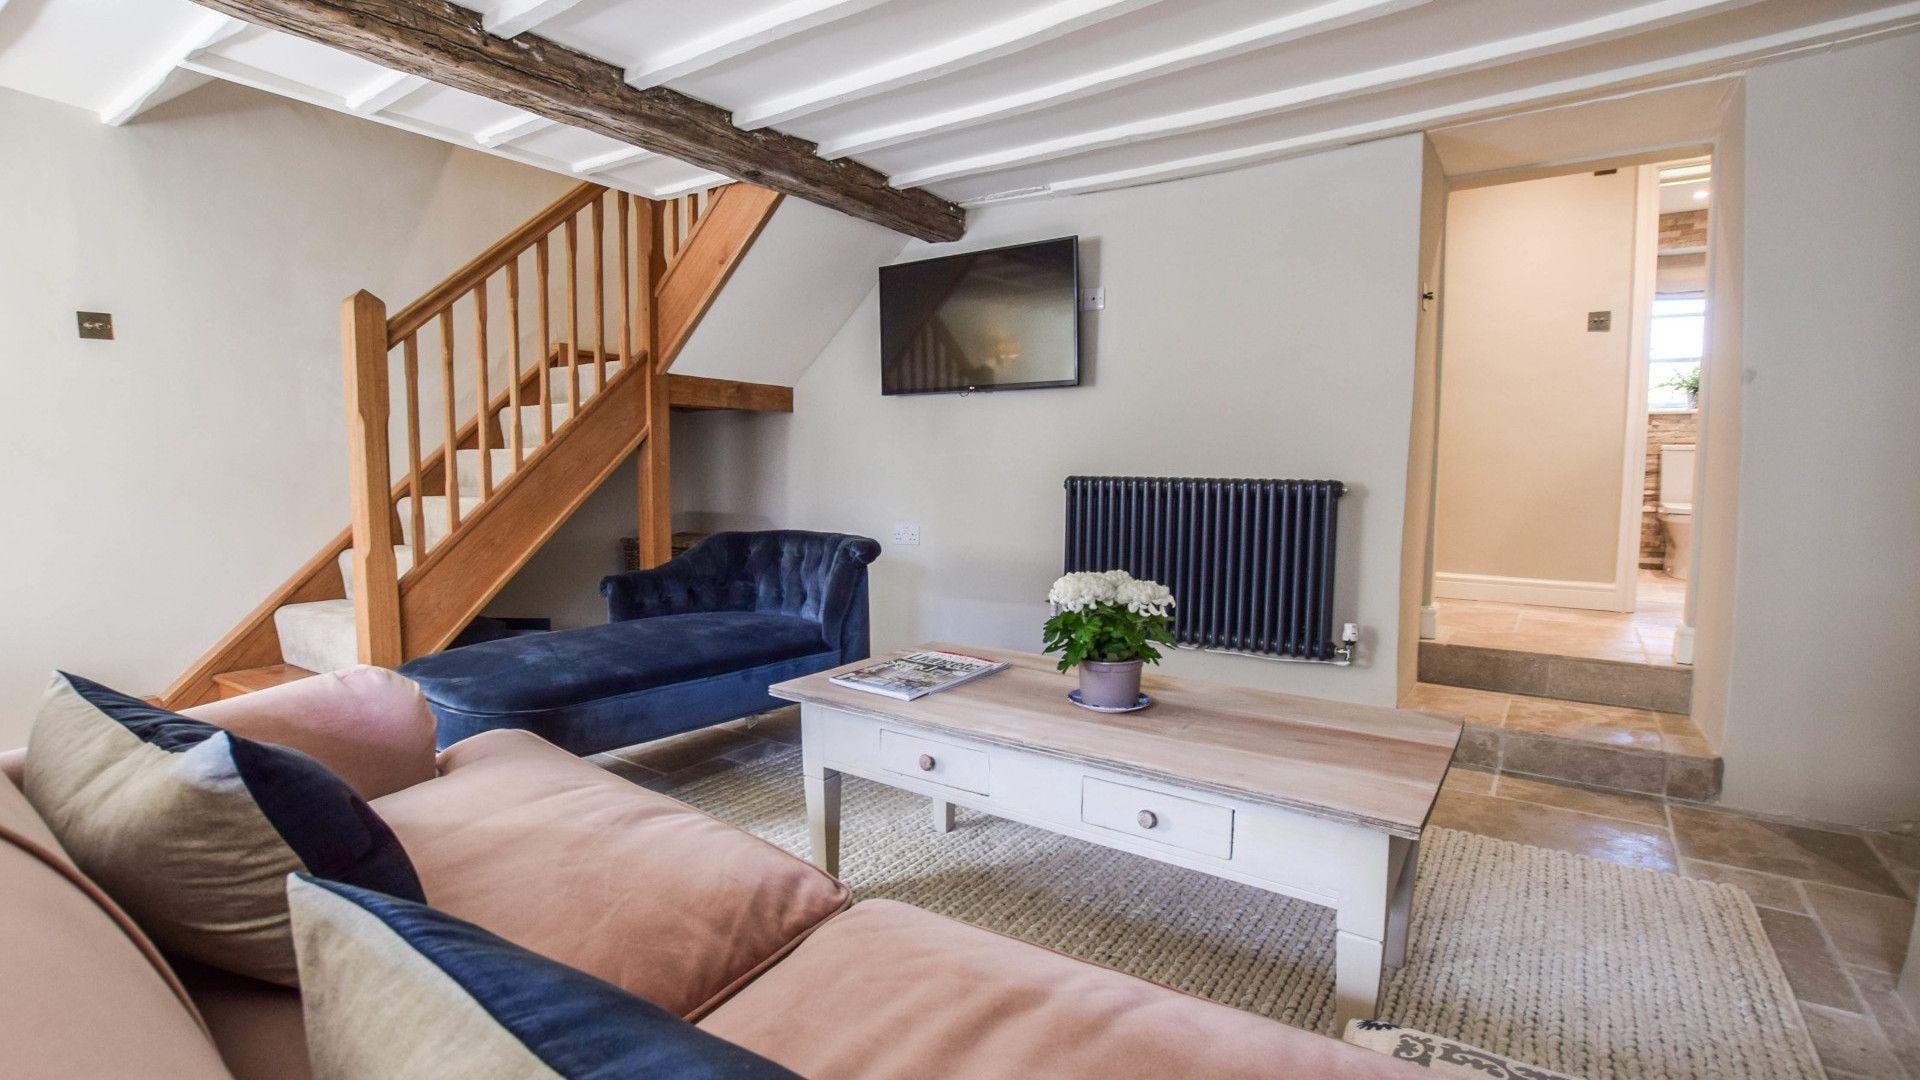 Snug with T.V, Lovell Cottage, Bolthole Retreats